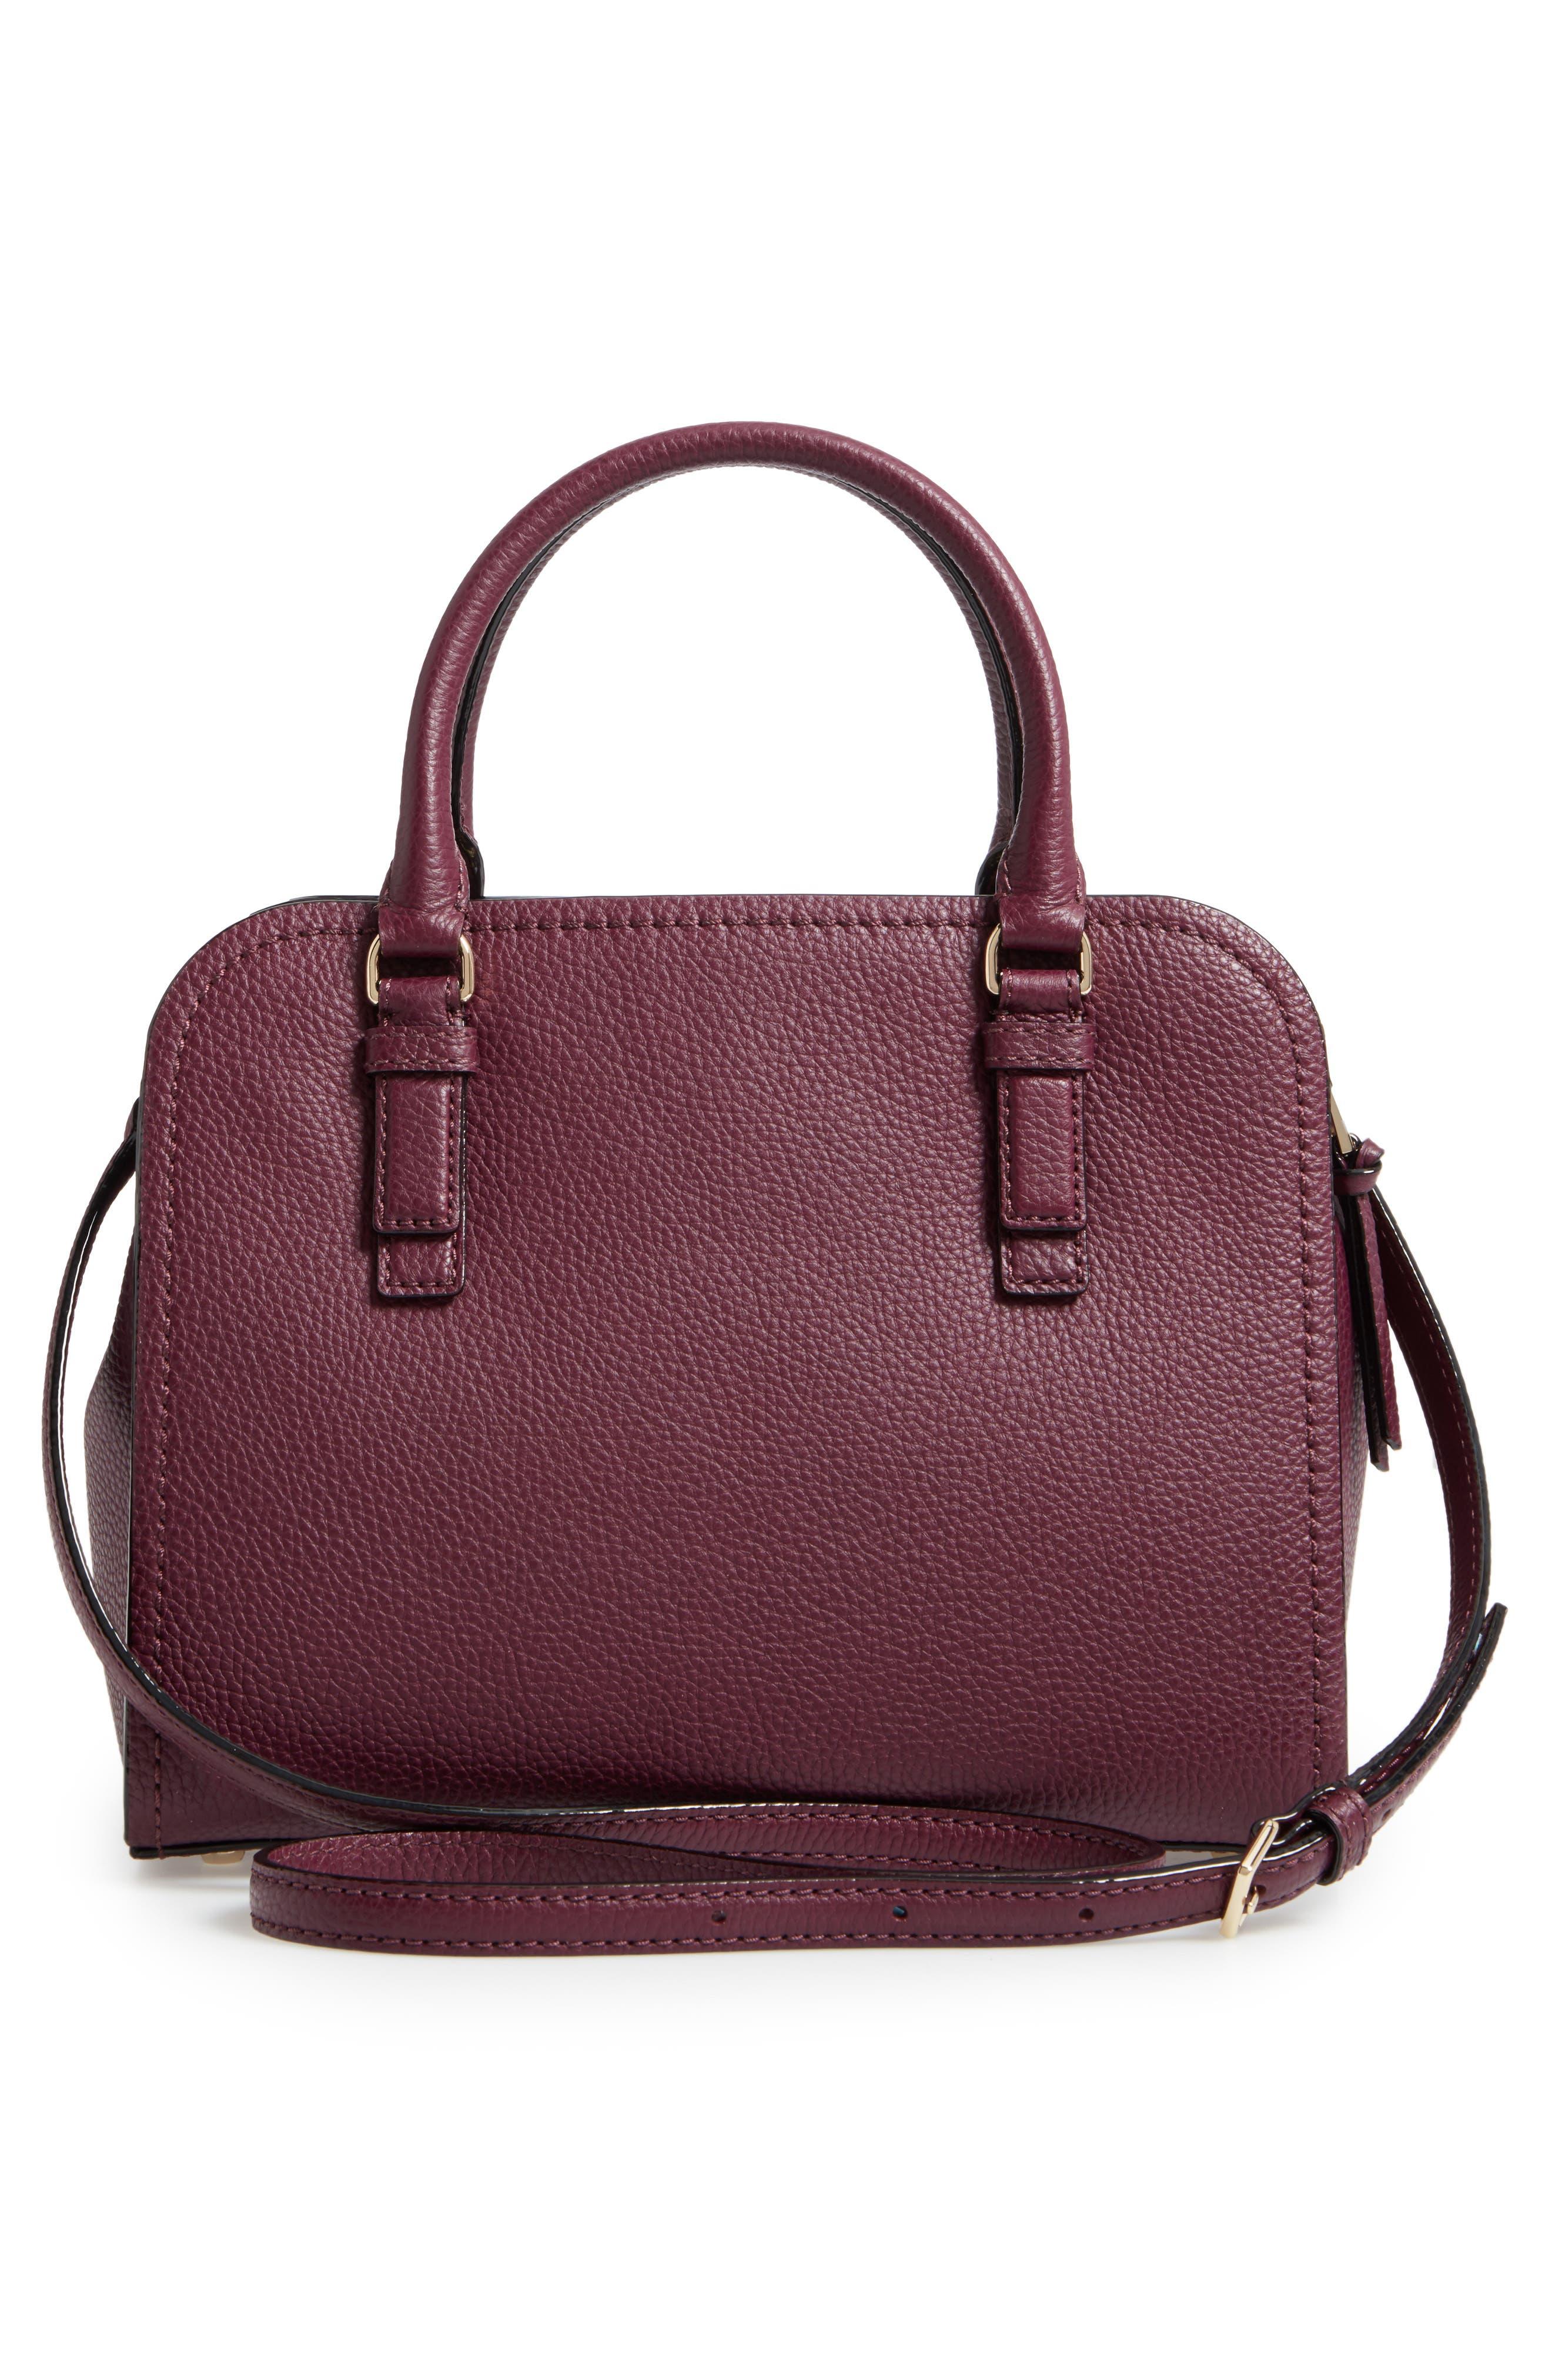 jackson street small kiernan leather top handle satchel,                             Alternate thumbnail 3, color,                             545